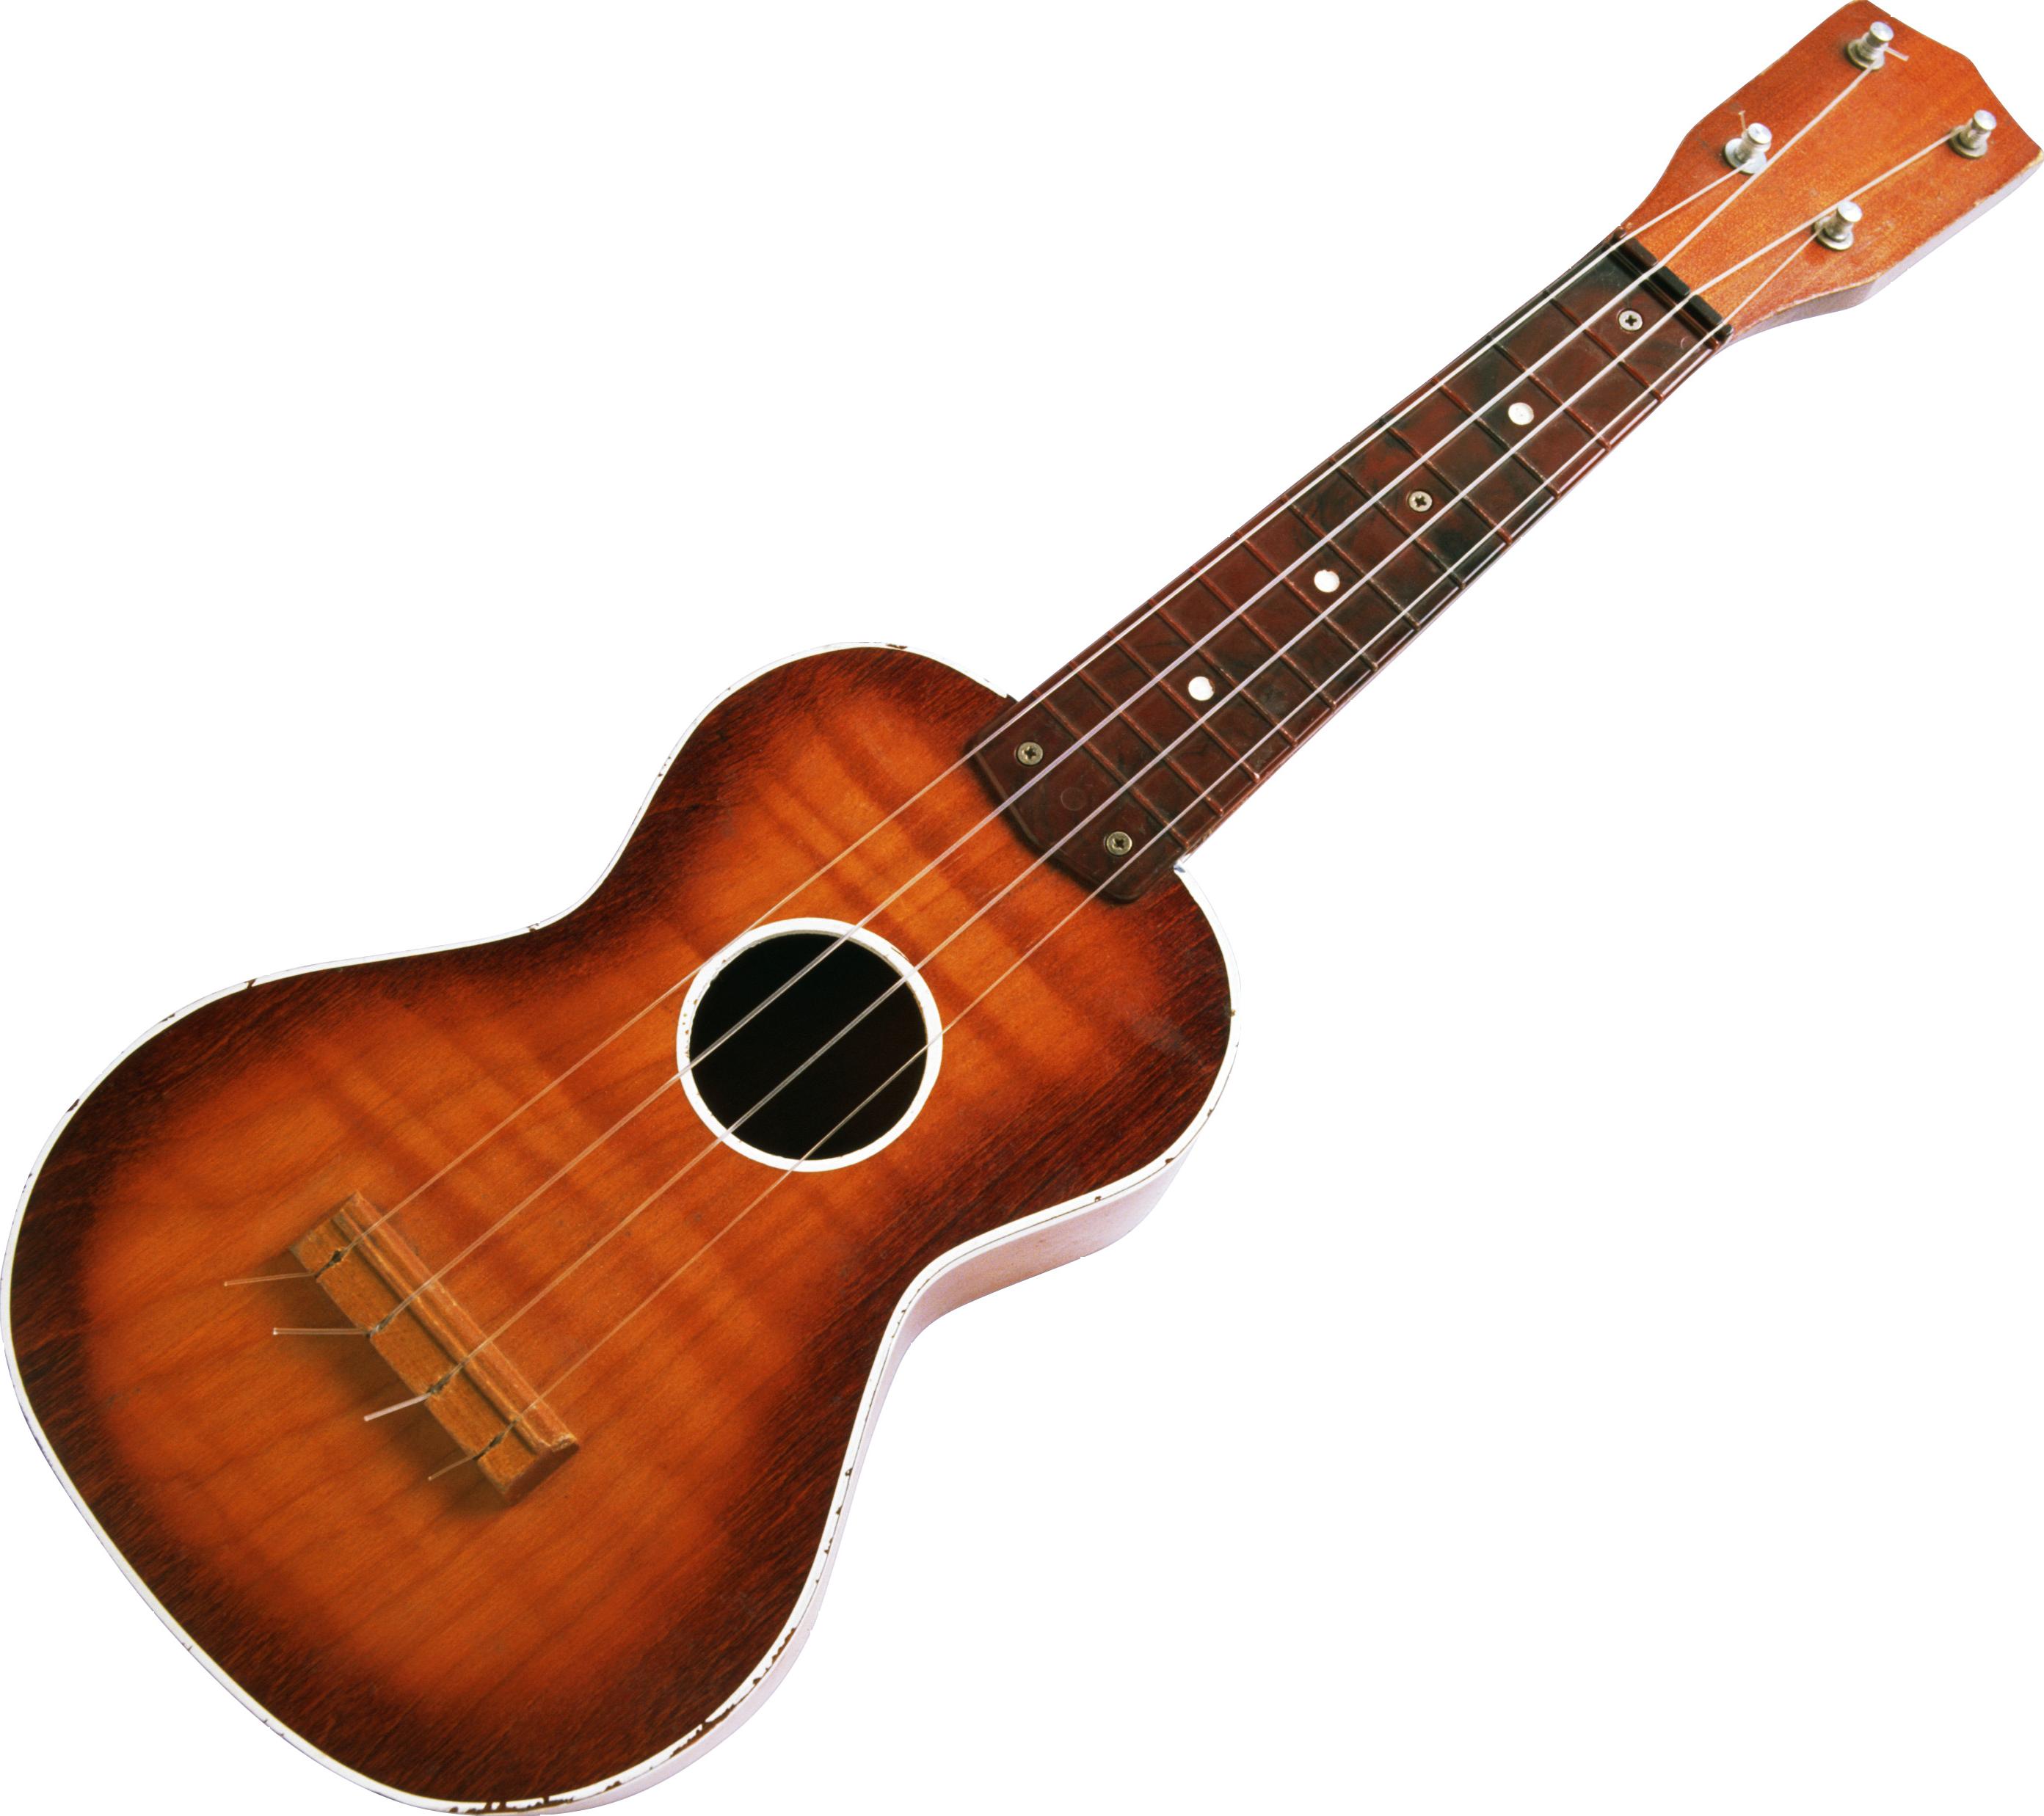 Acoustic Classic Guitar Png Image Guitar Picsart Editing Background